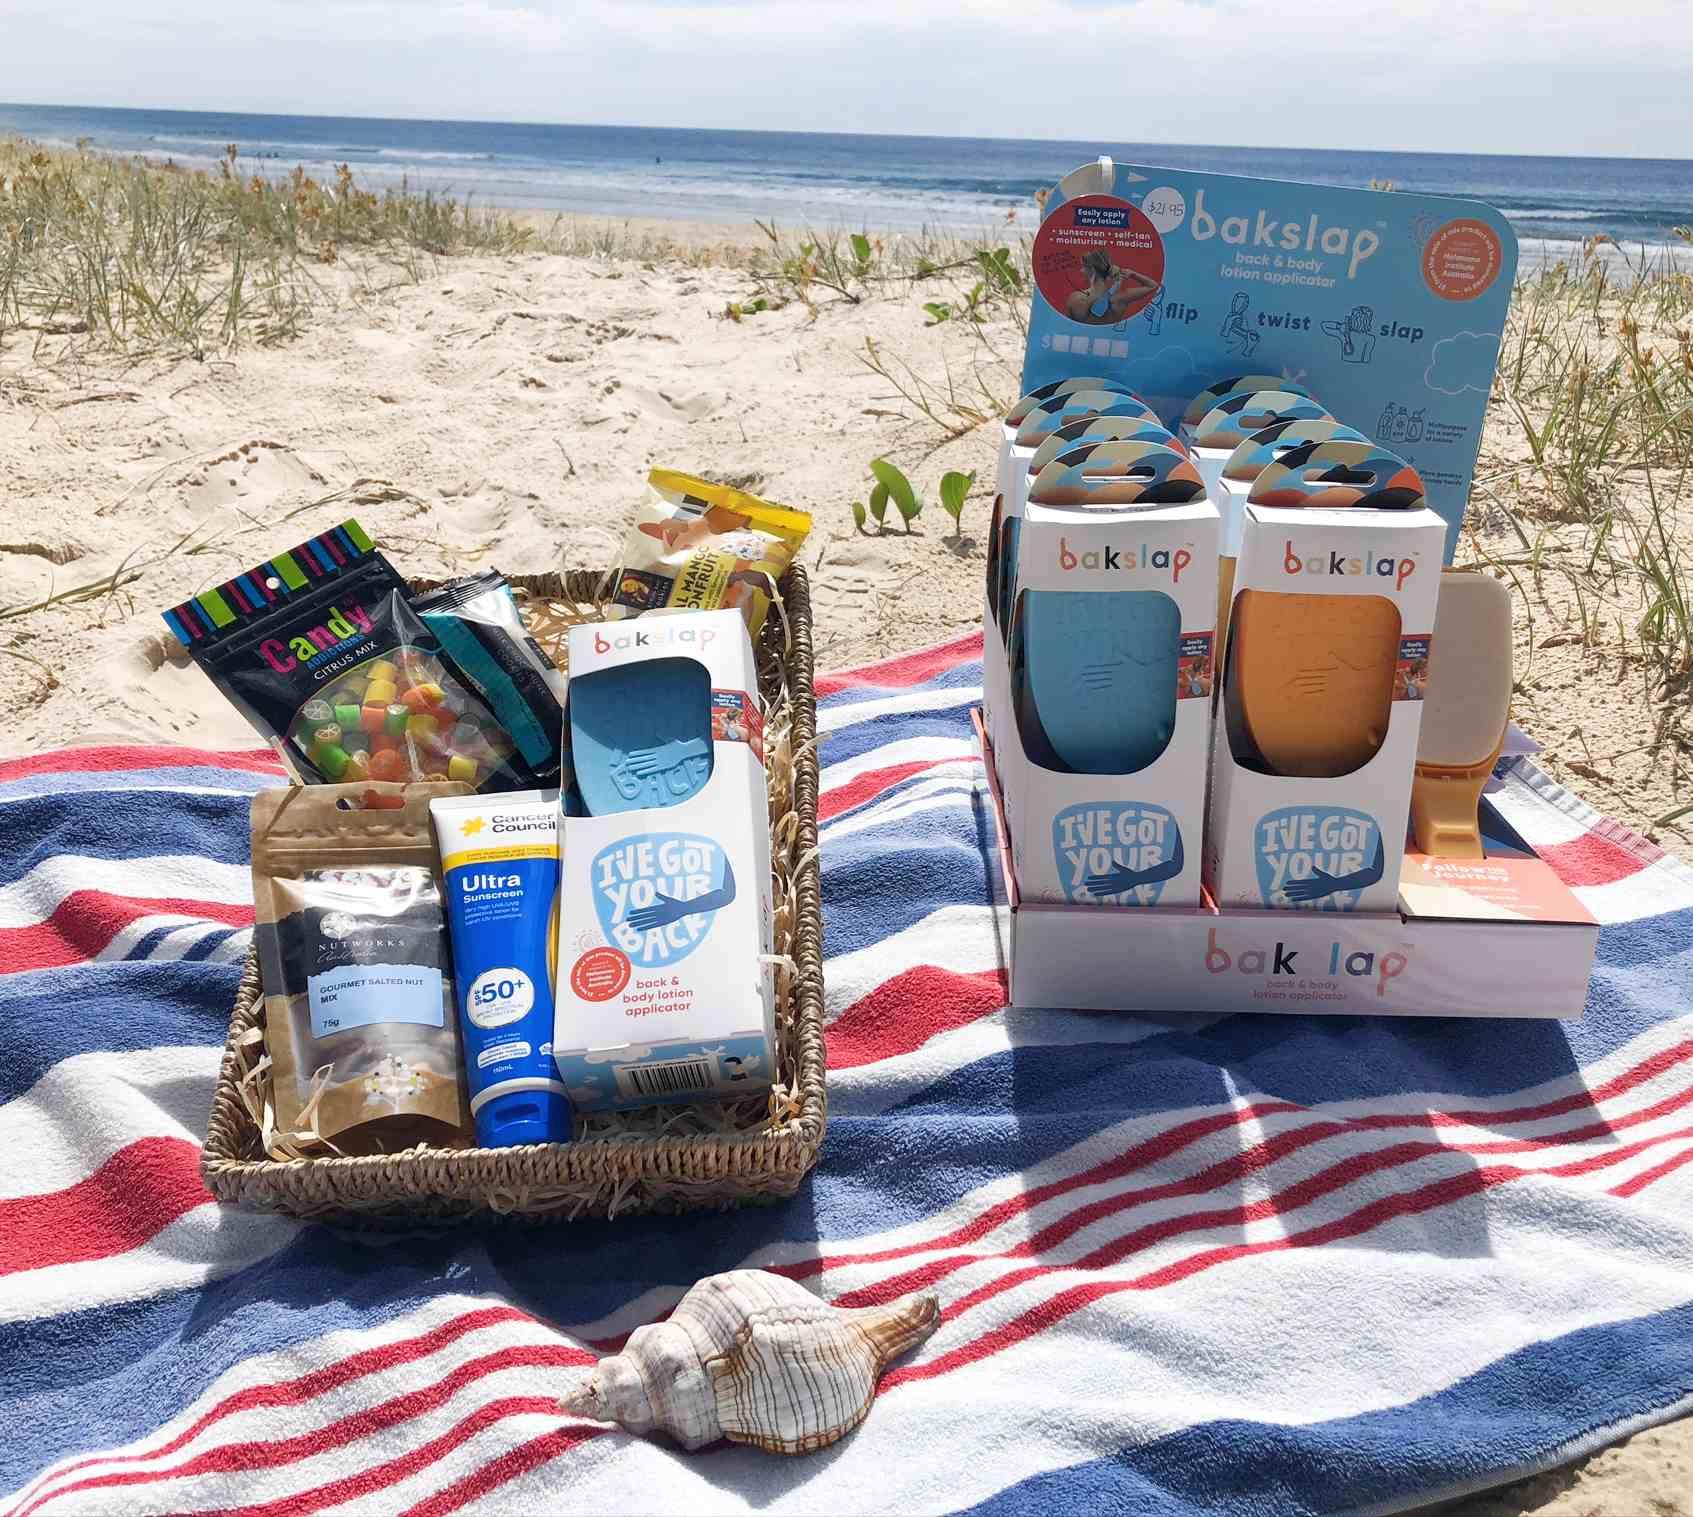 bakslap product hamper on beach